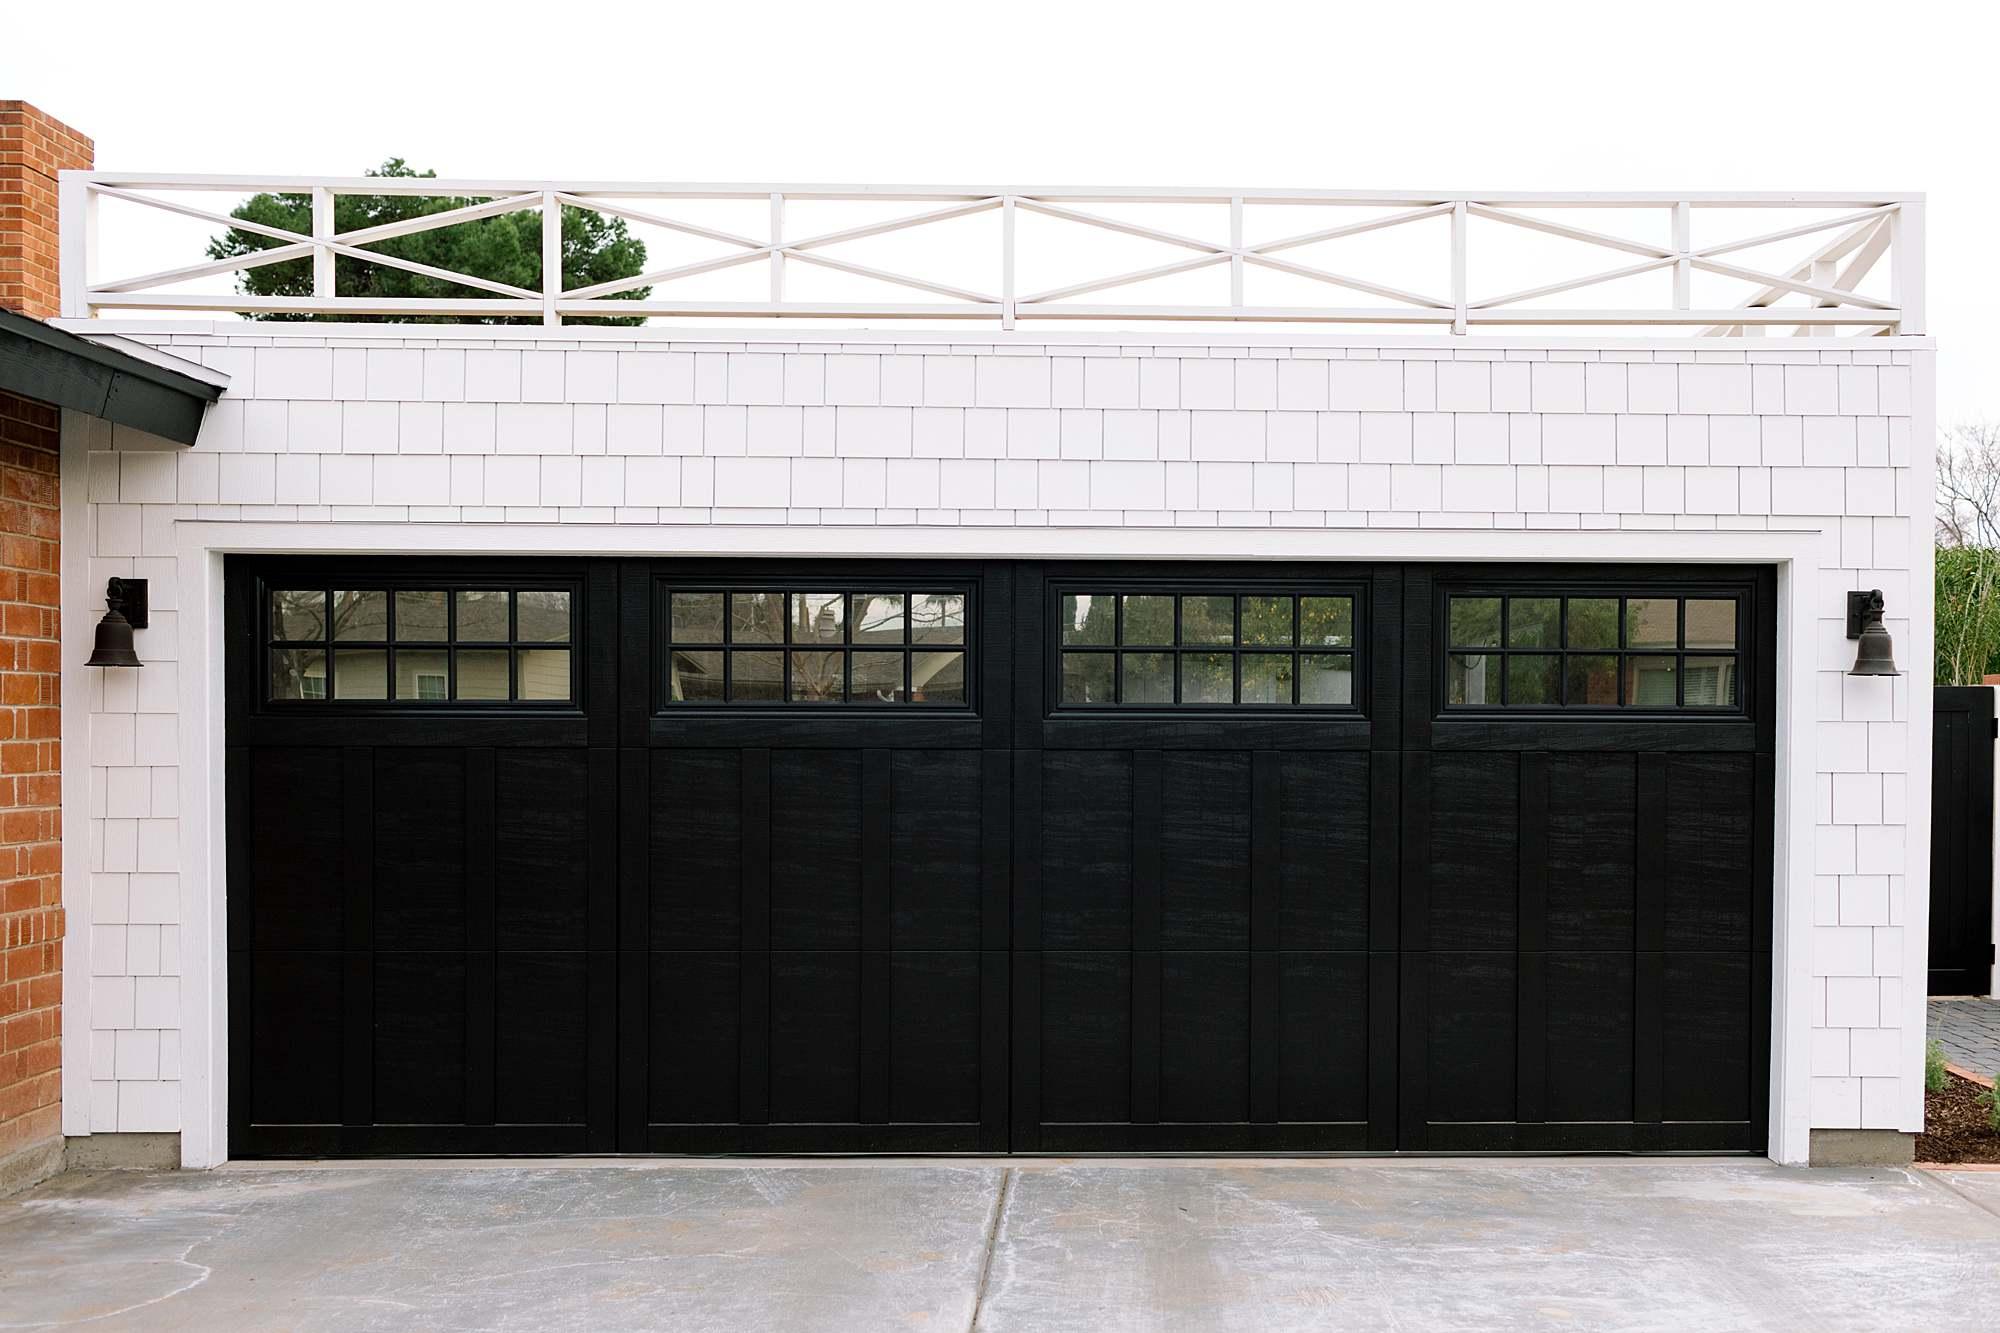 flat roof open air garage ideas with railing - phoenix home blogger Diana Elizabeth